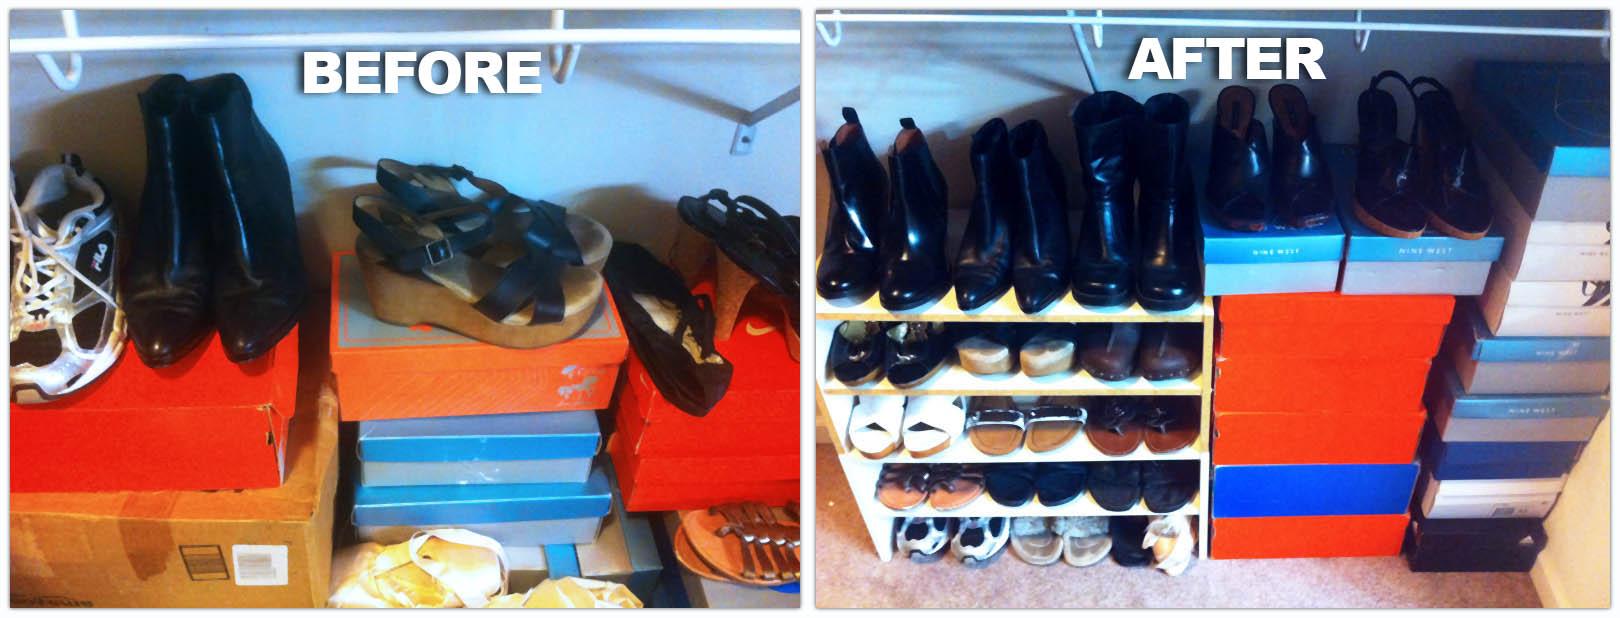 Monicau0027s Closet Shoes Organized